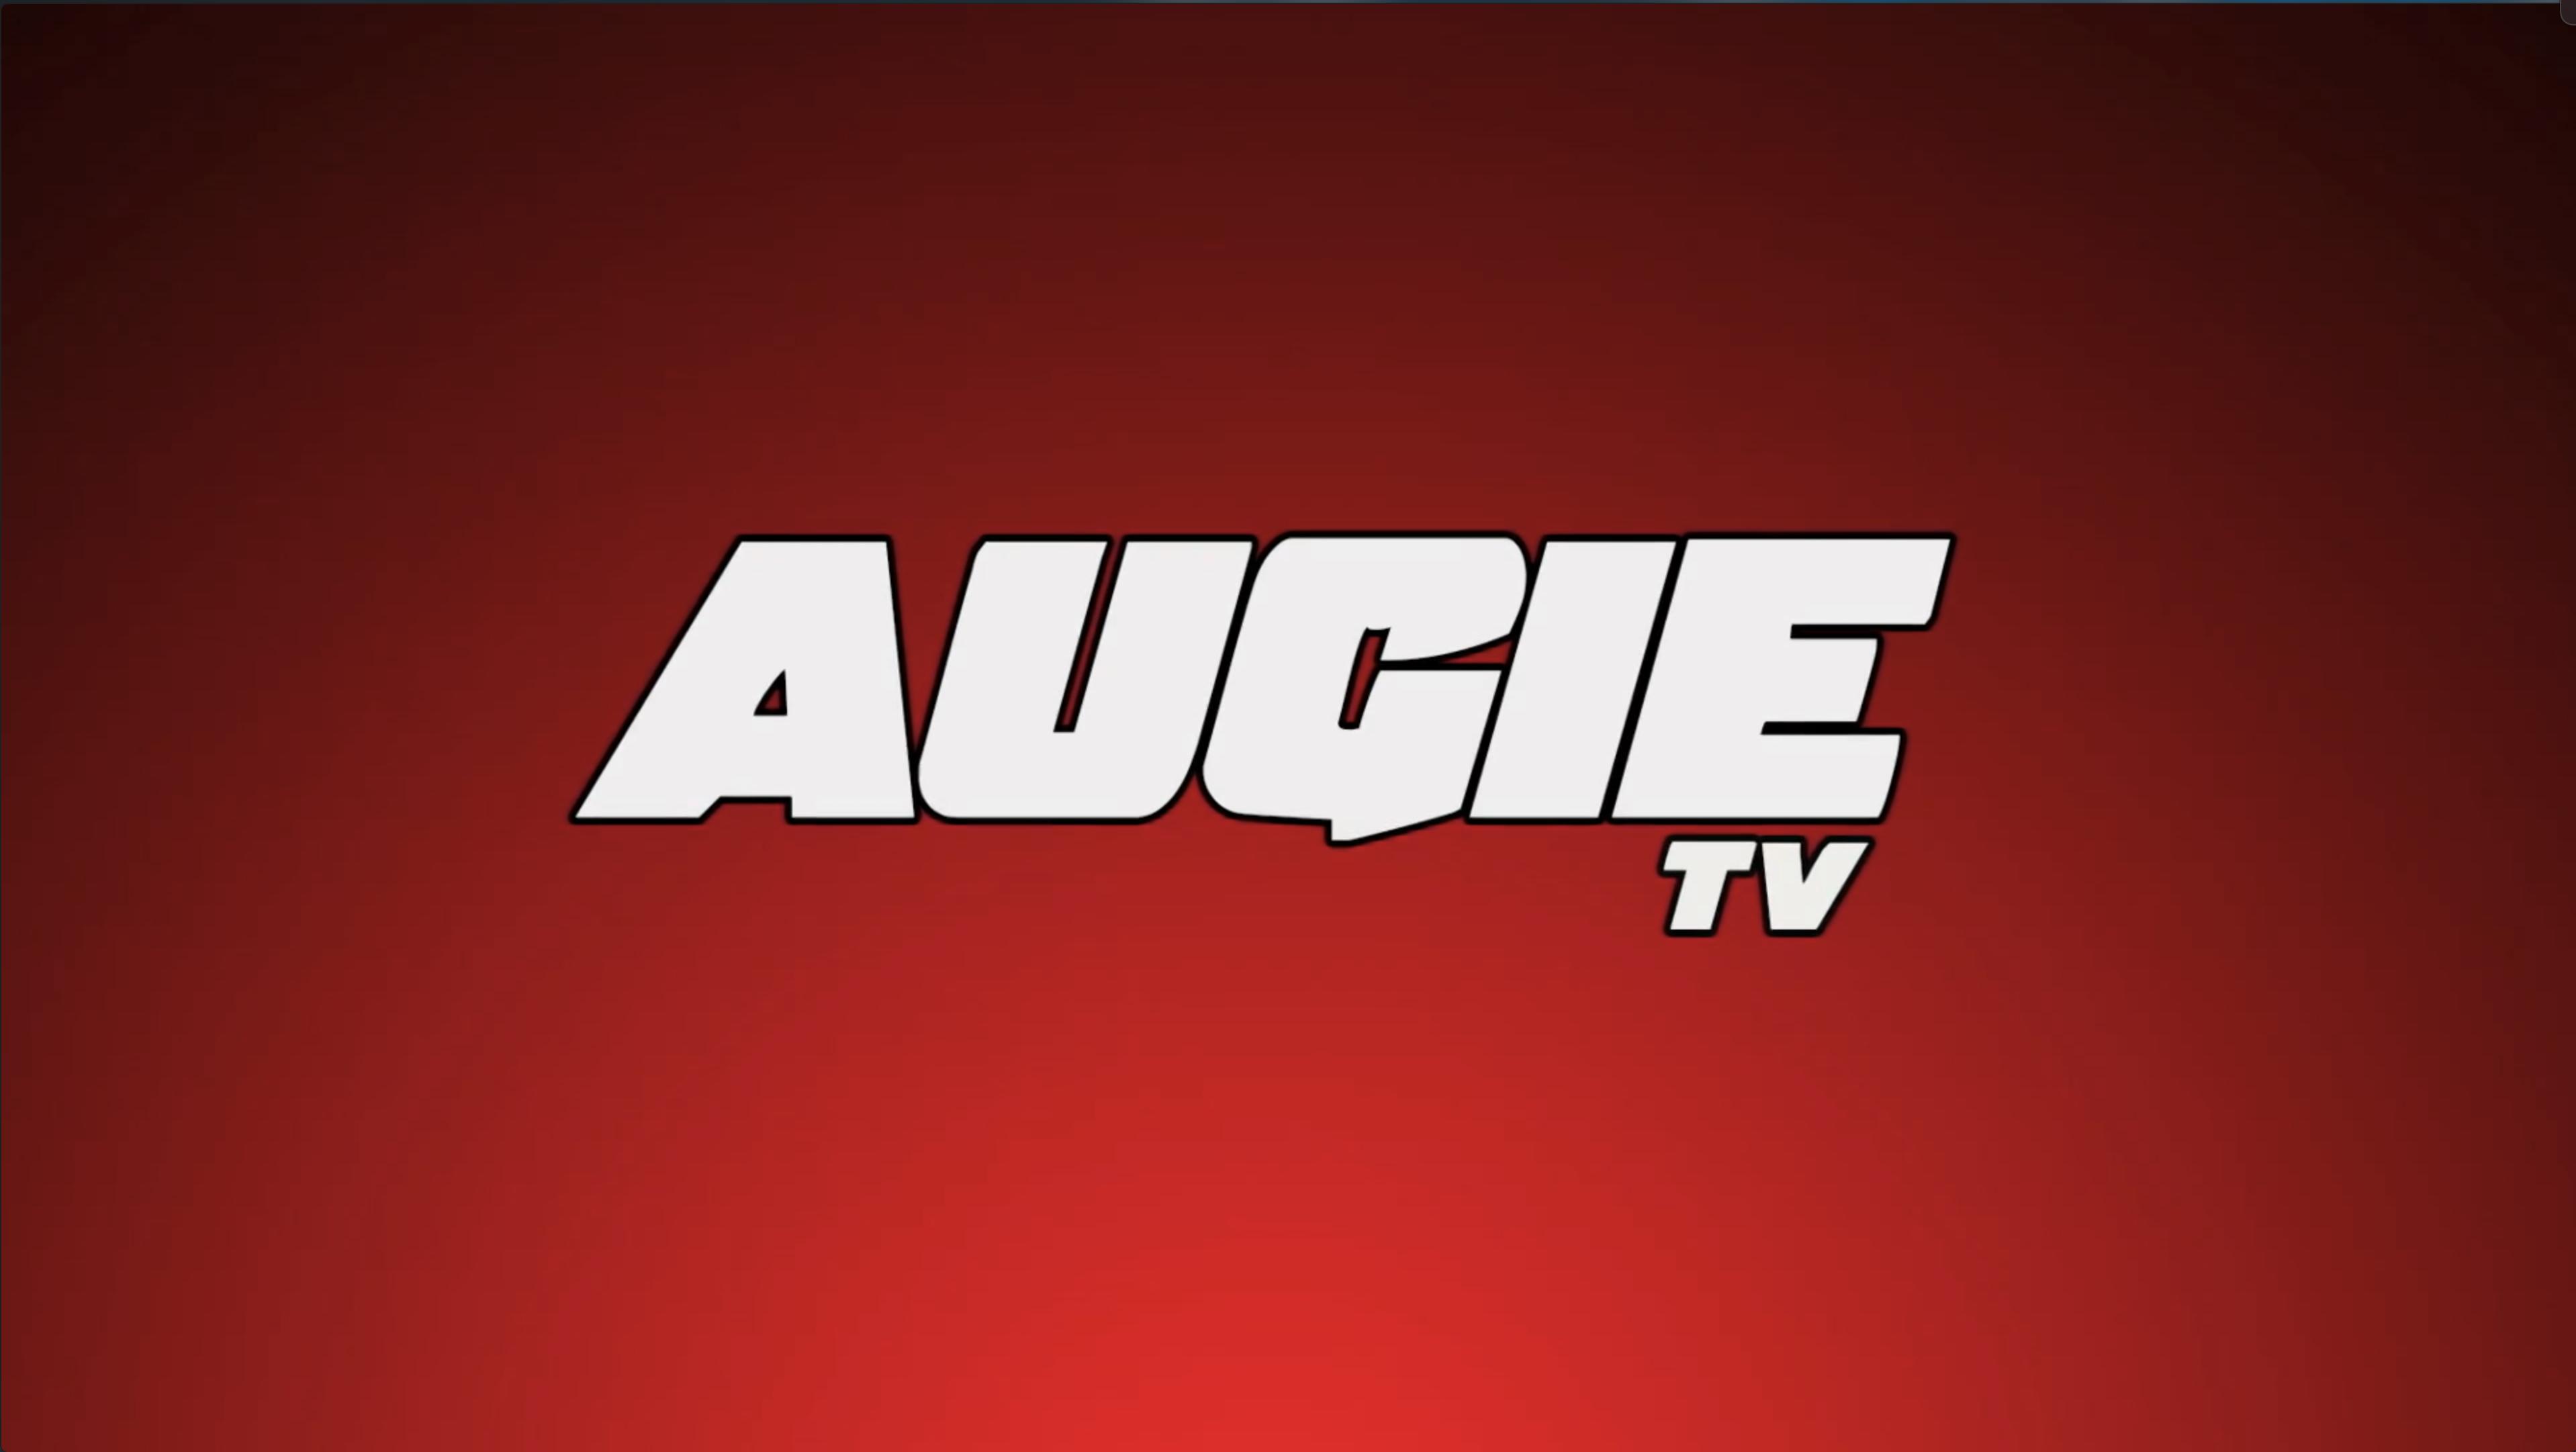 AUGIE TV 1